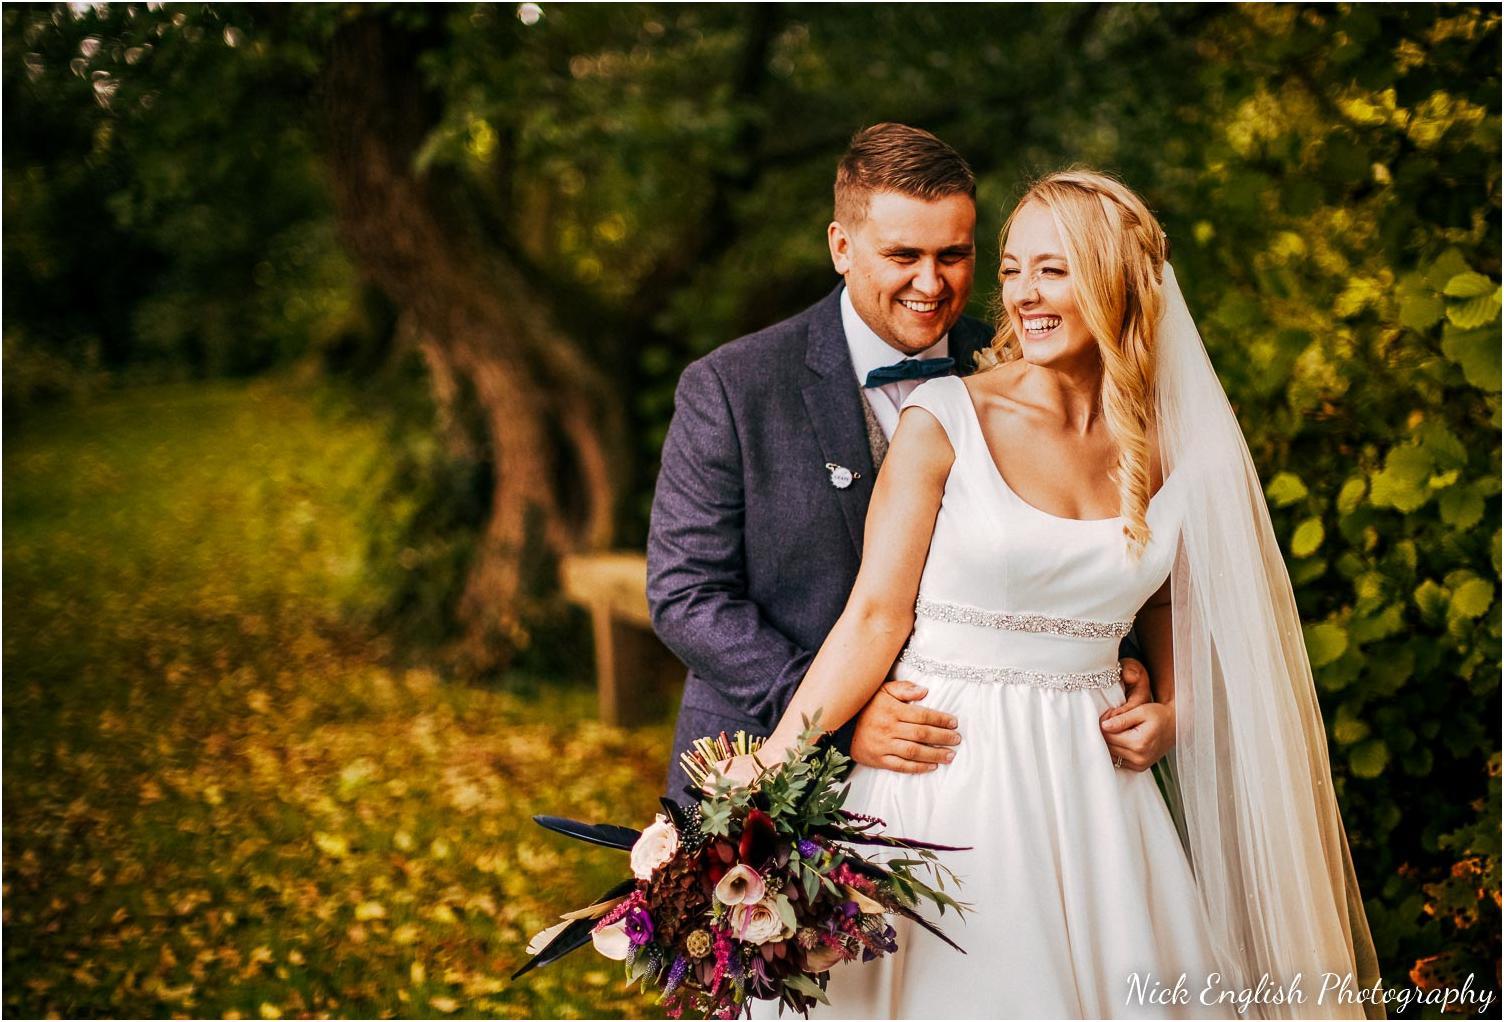 The_Ashes_Barn_Endon_Stoke_Wedding_Photographer-75.jpg